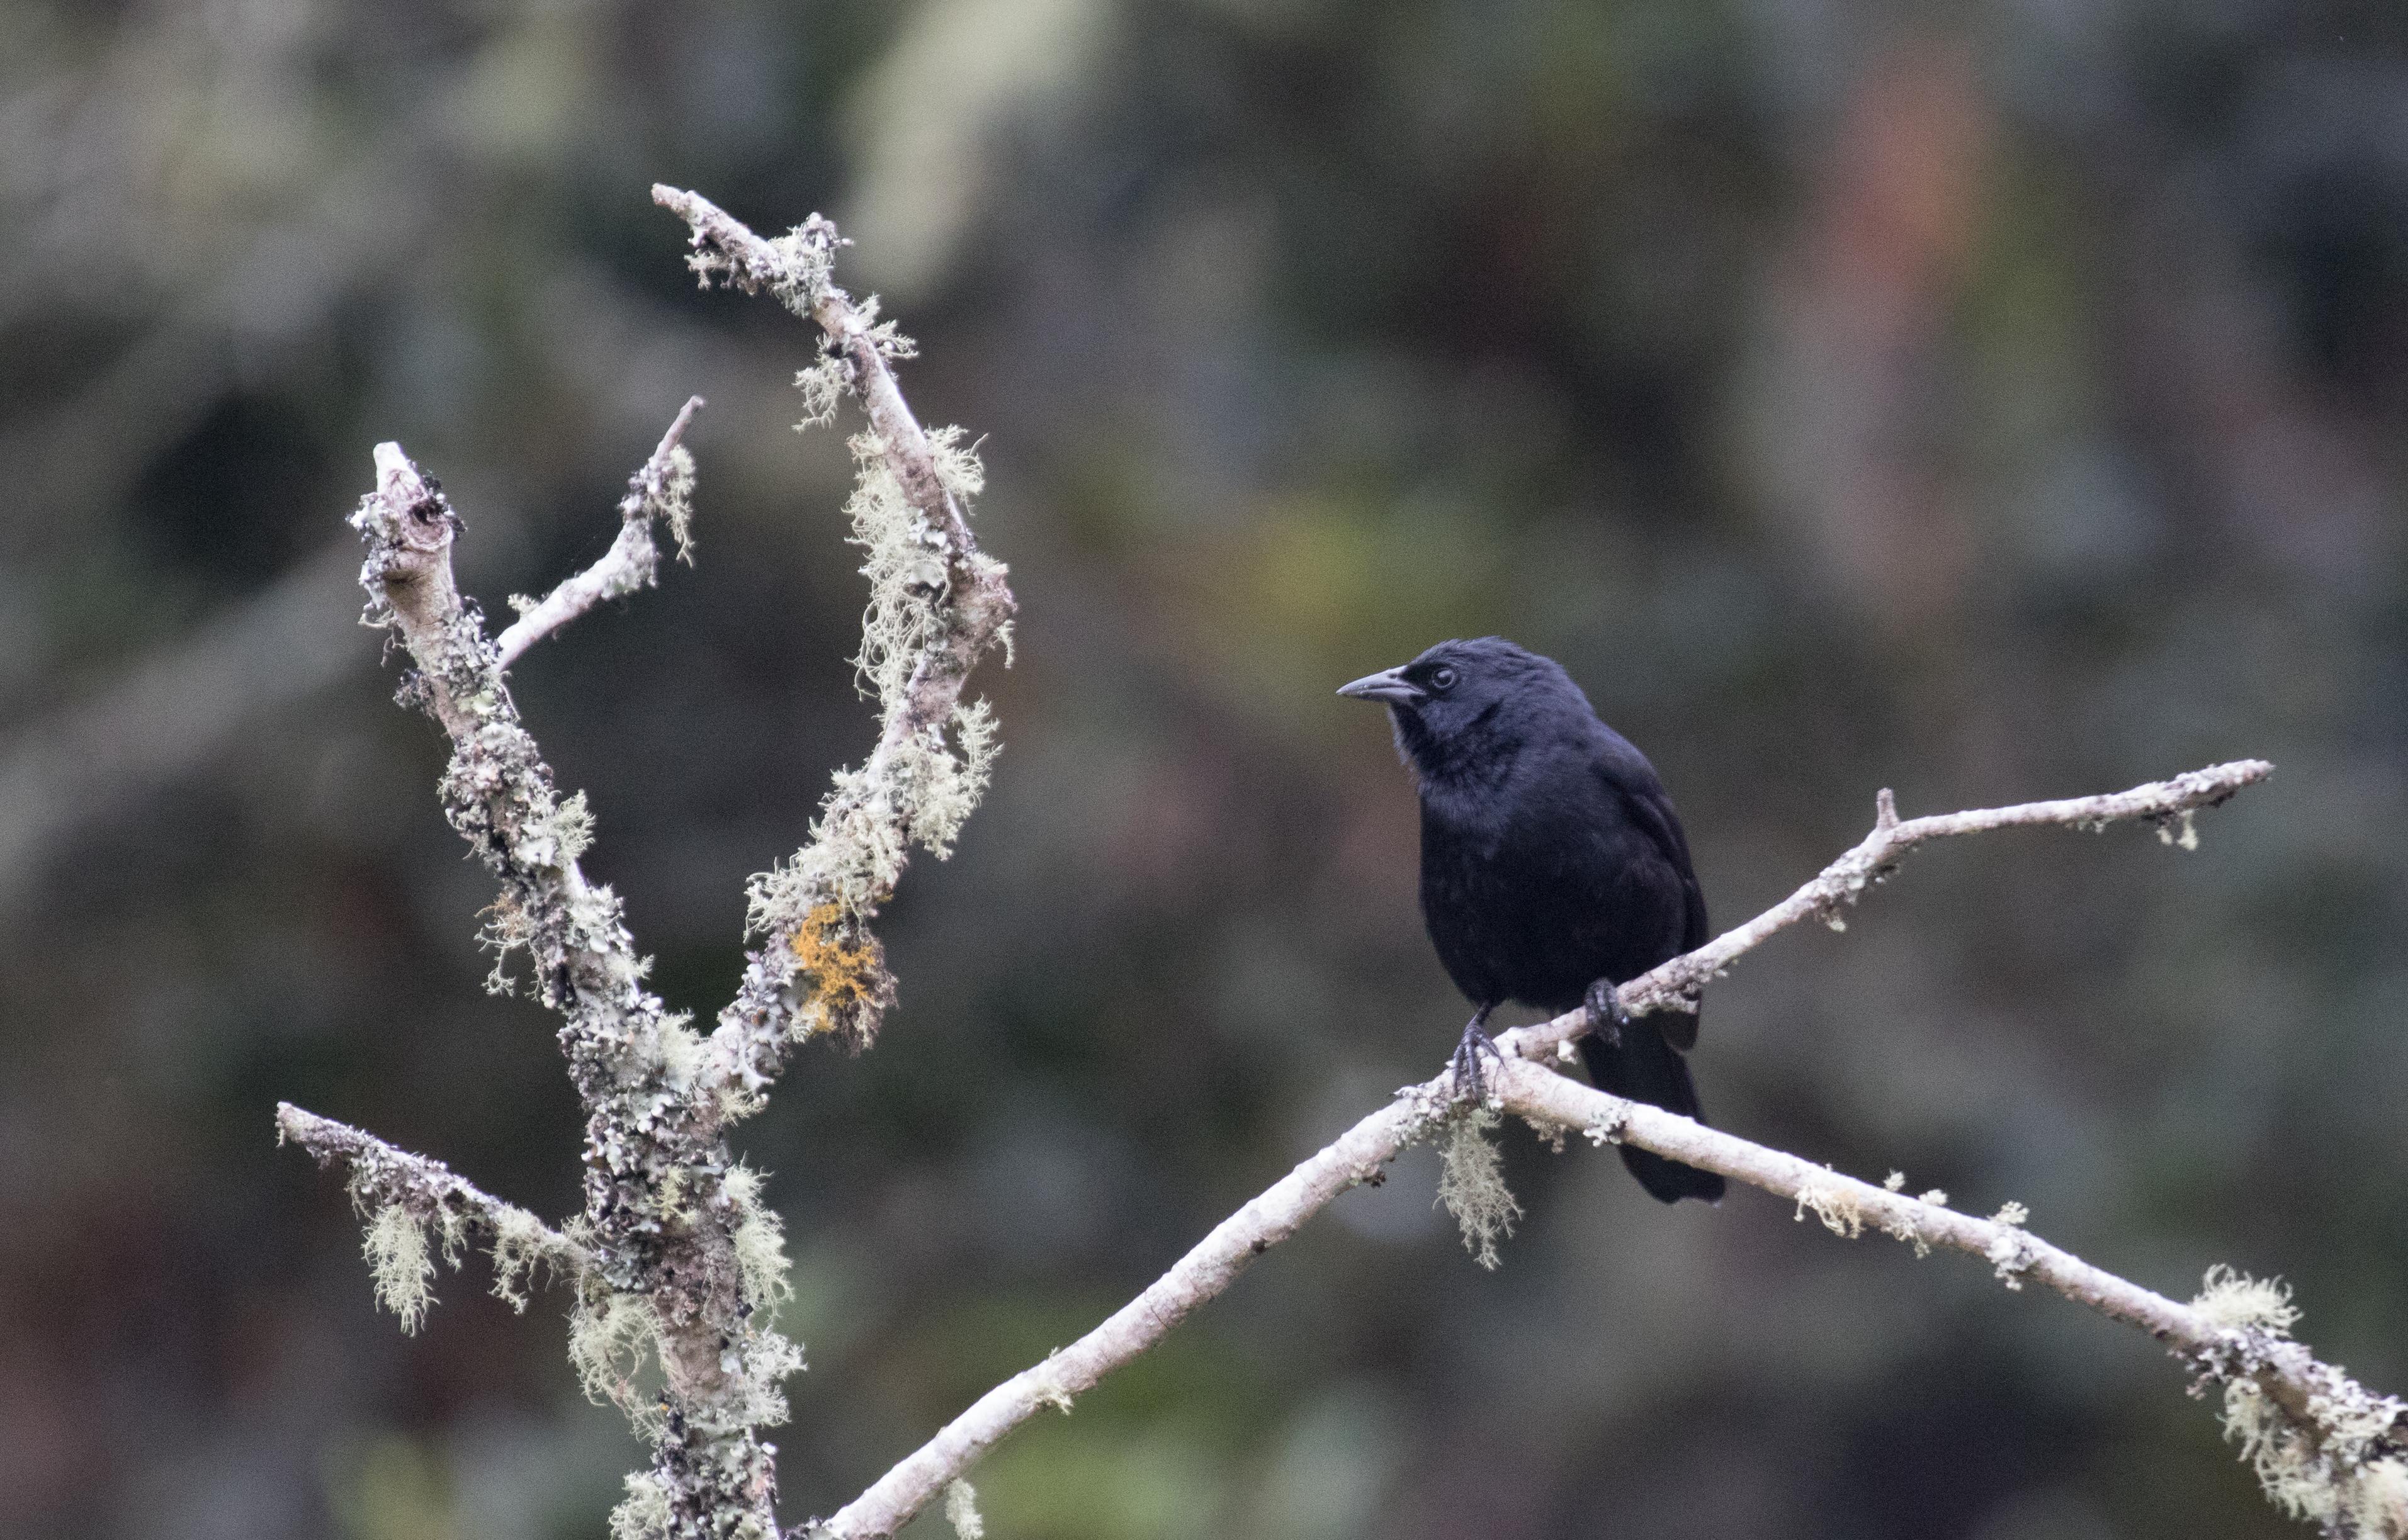 Birding Colombia: 4 days around Bogota and Soata